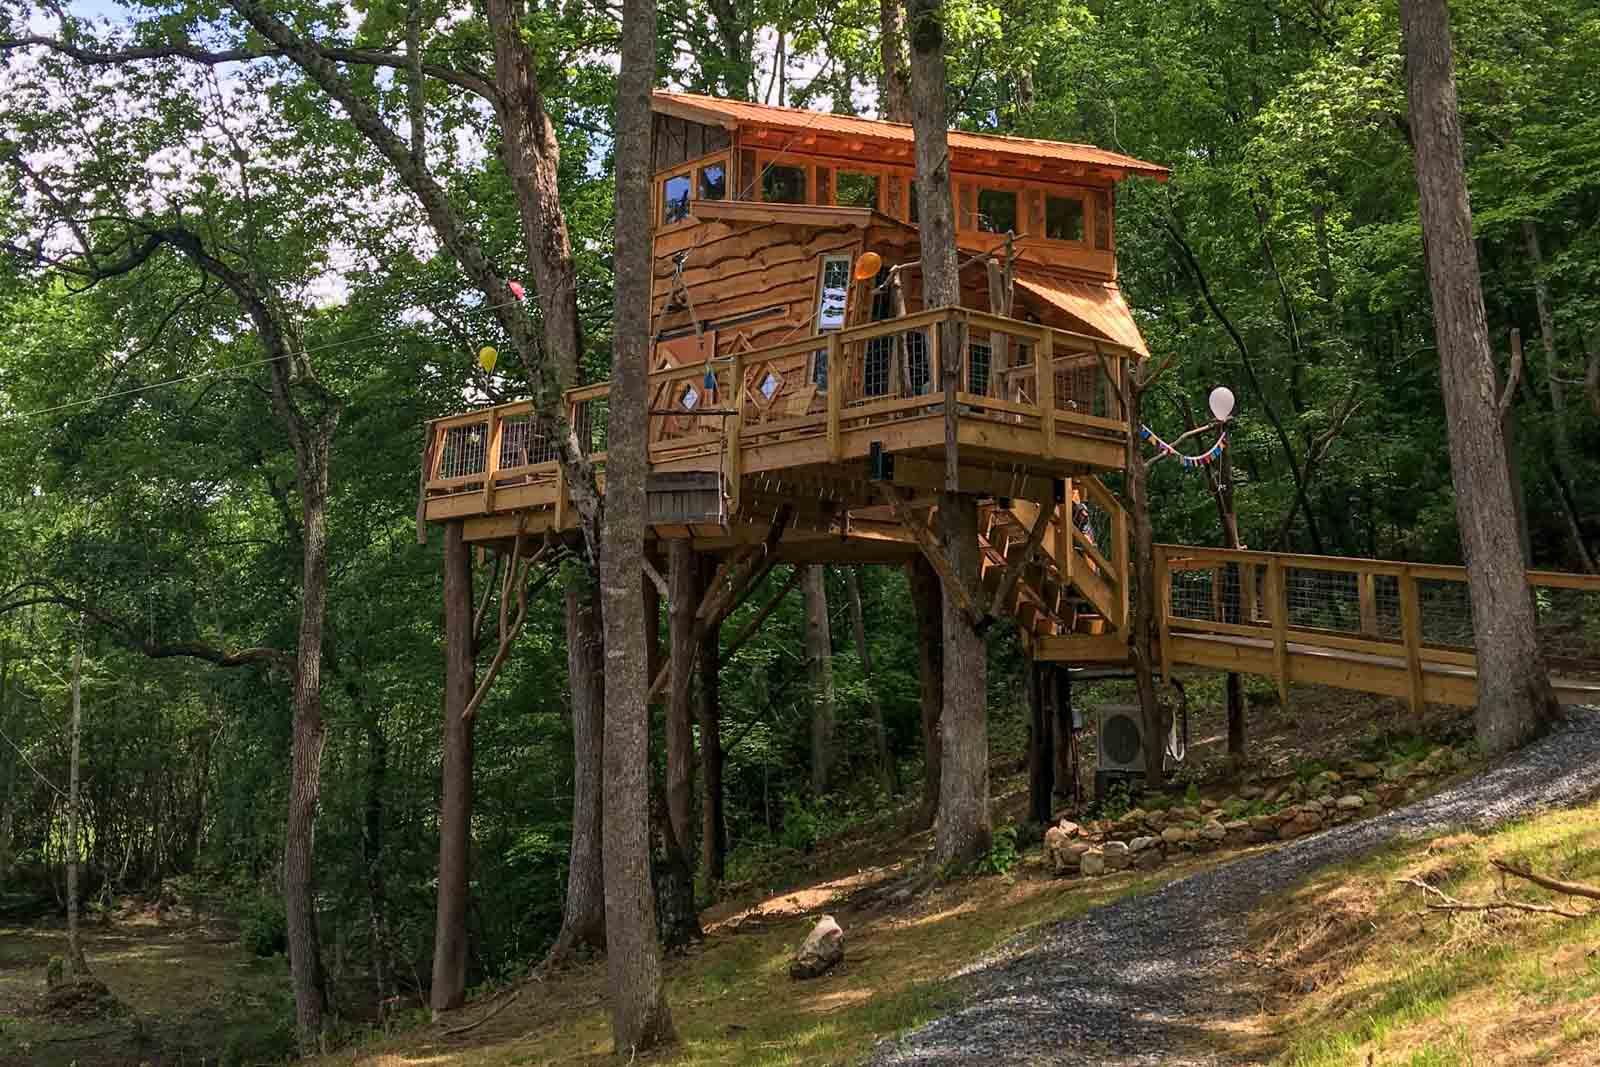 Blue Ridge Treehouse, located at Bear Claw Vineyards in Blue Ridge, GA